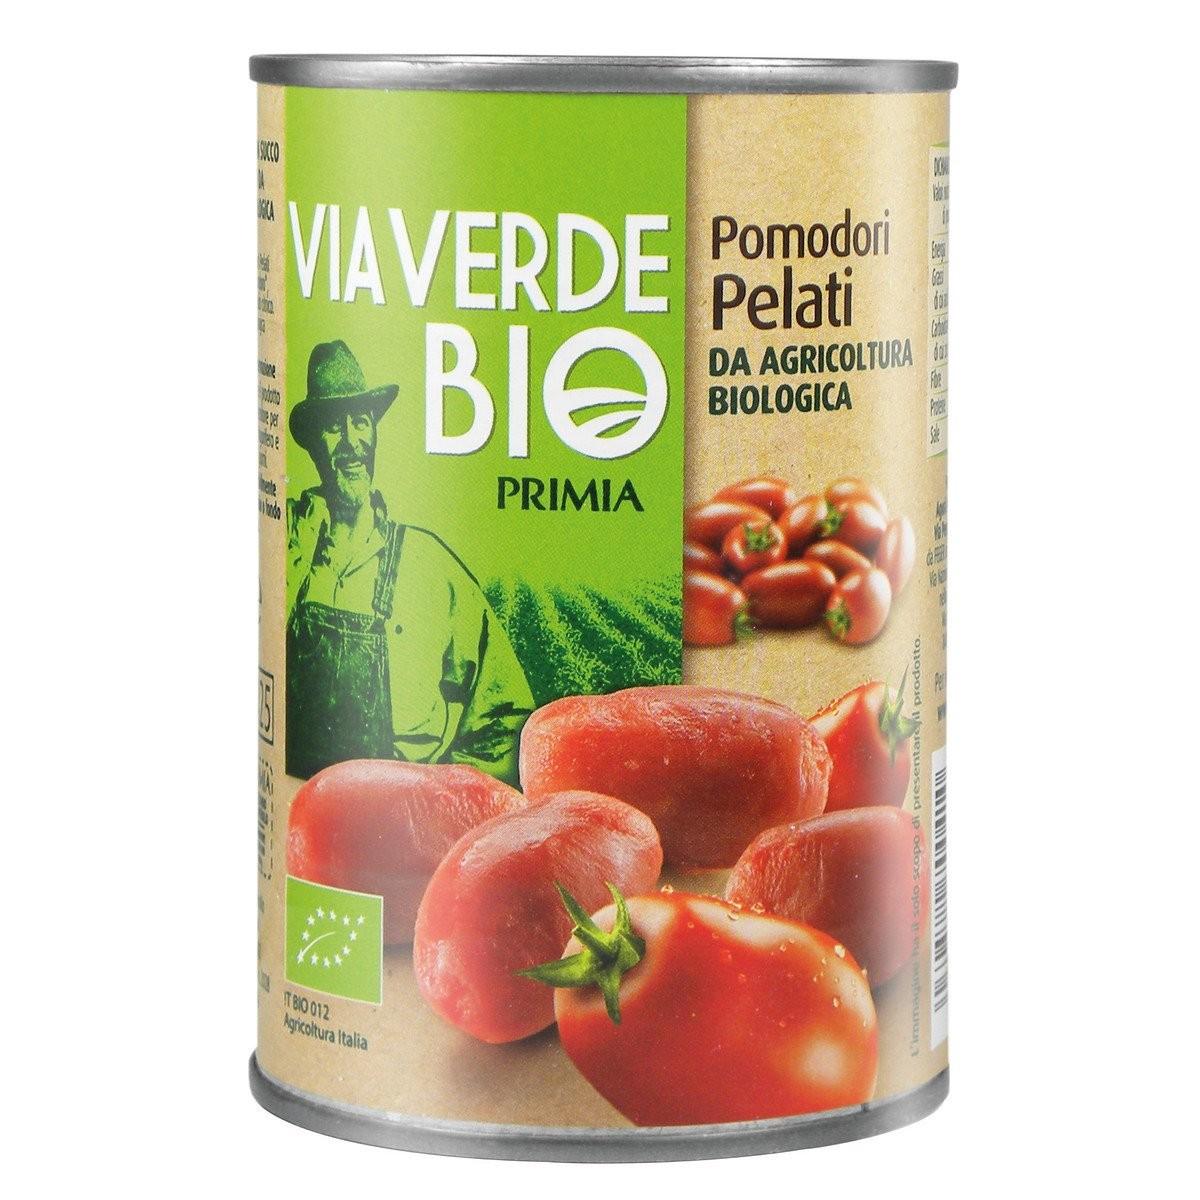 Primia Pomodori pelati Via Verde Bio